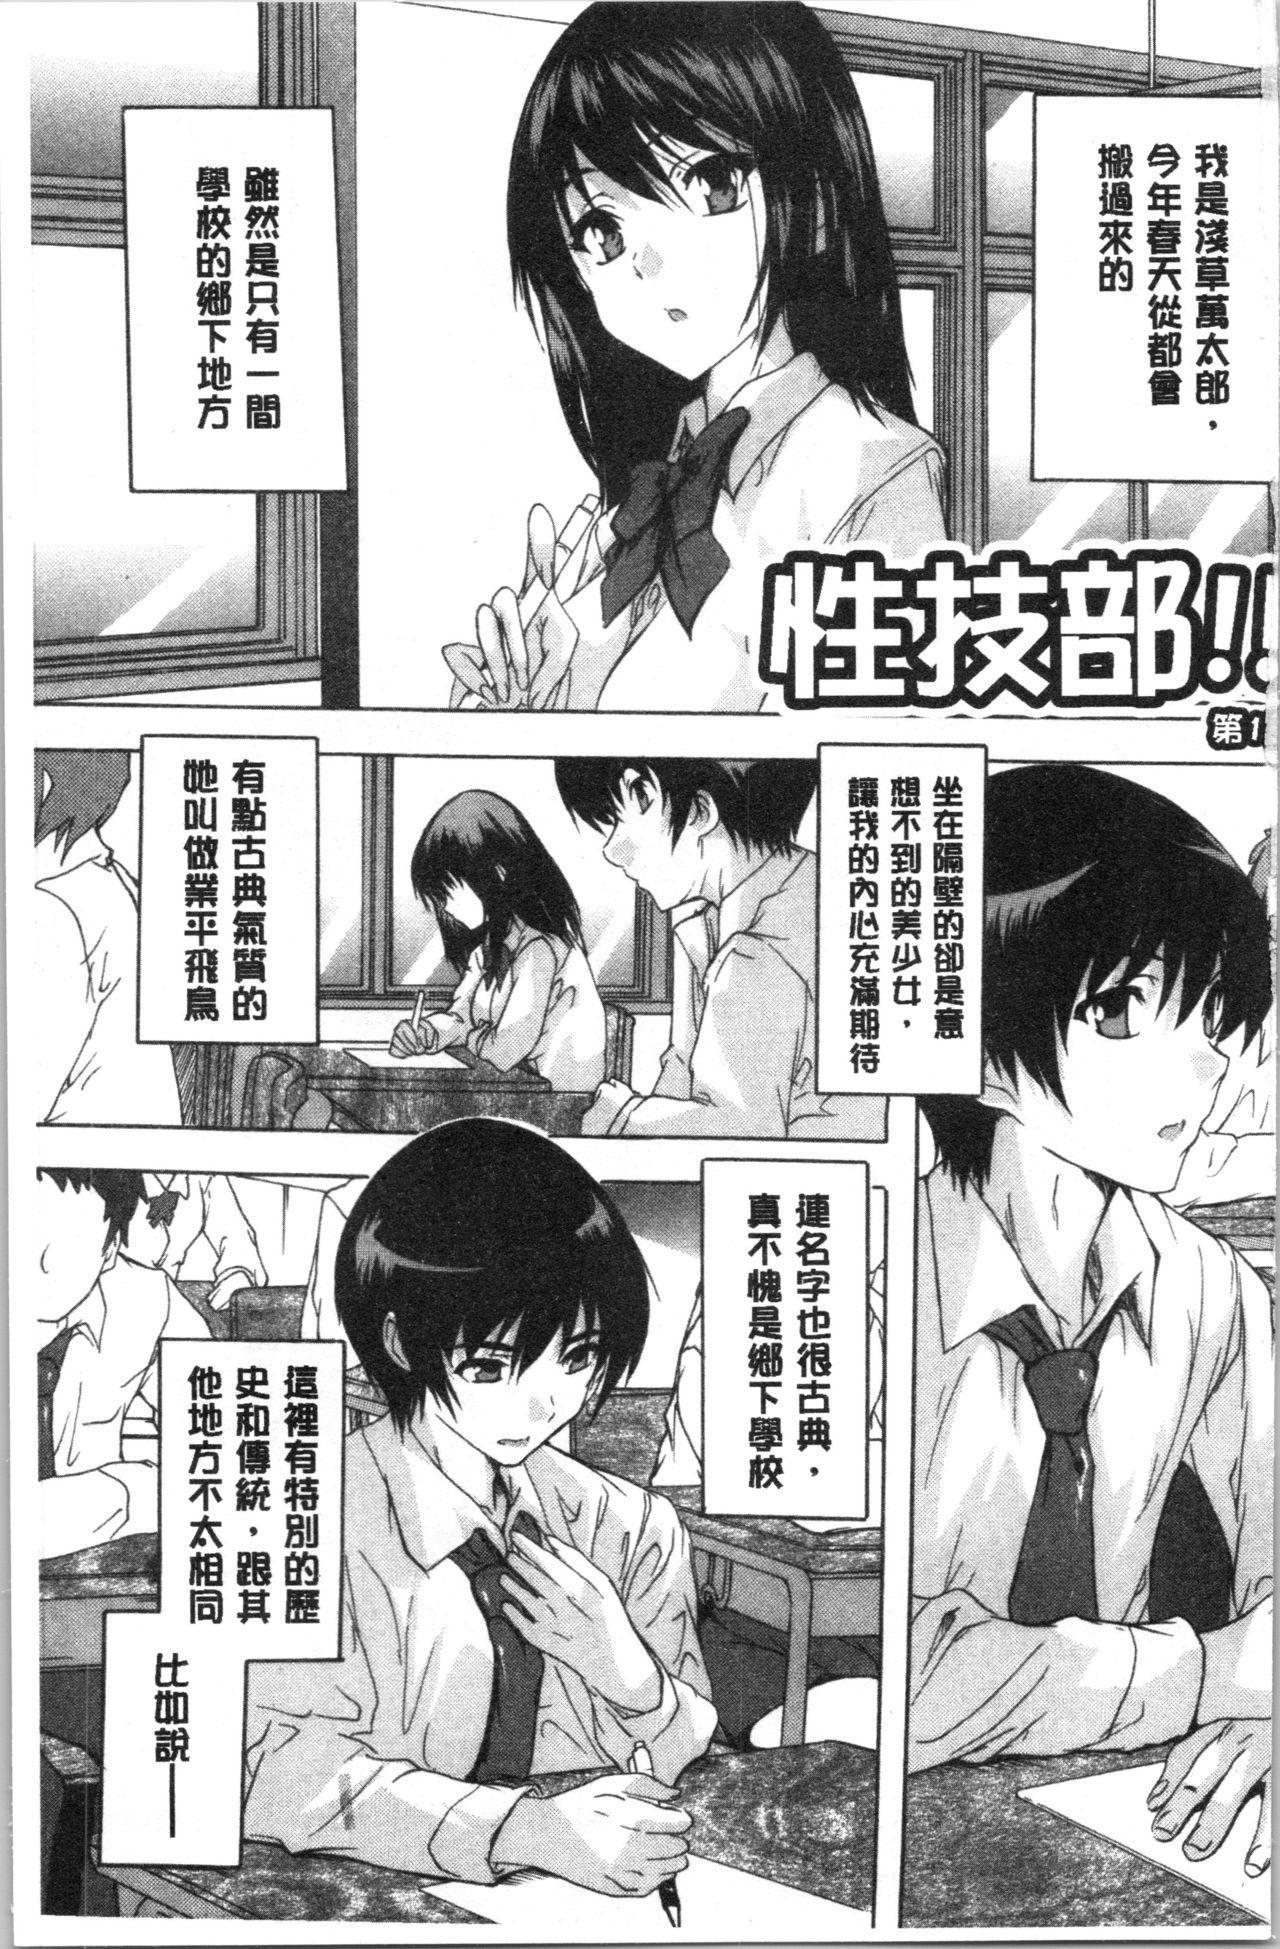 [Natsuka Q-Ya] Hisshuu!! Sex-bu - SEIGI-DO The Ultimate Martial Arts   必修!!性愛淫交部 [Chinese] 3